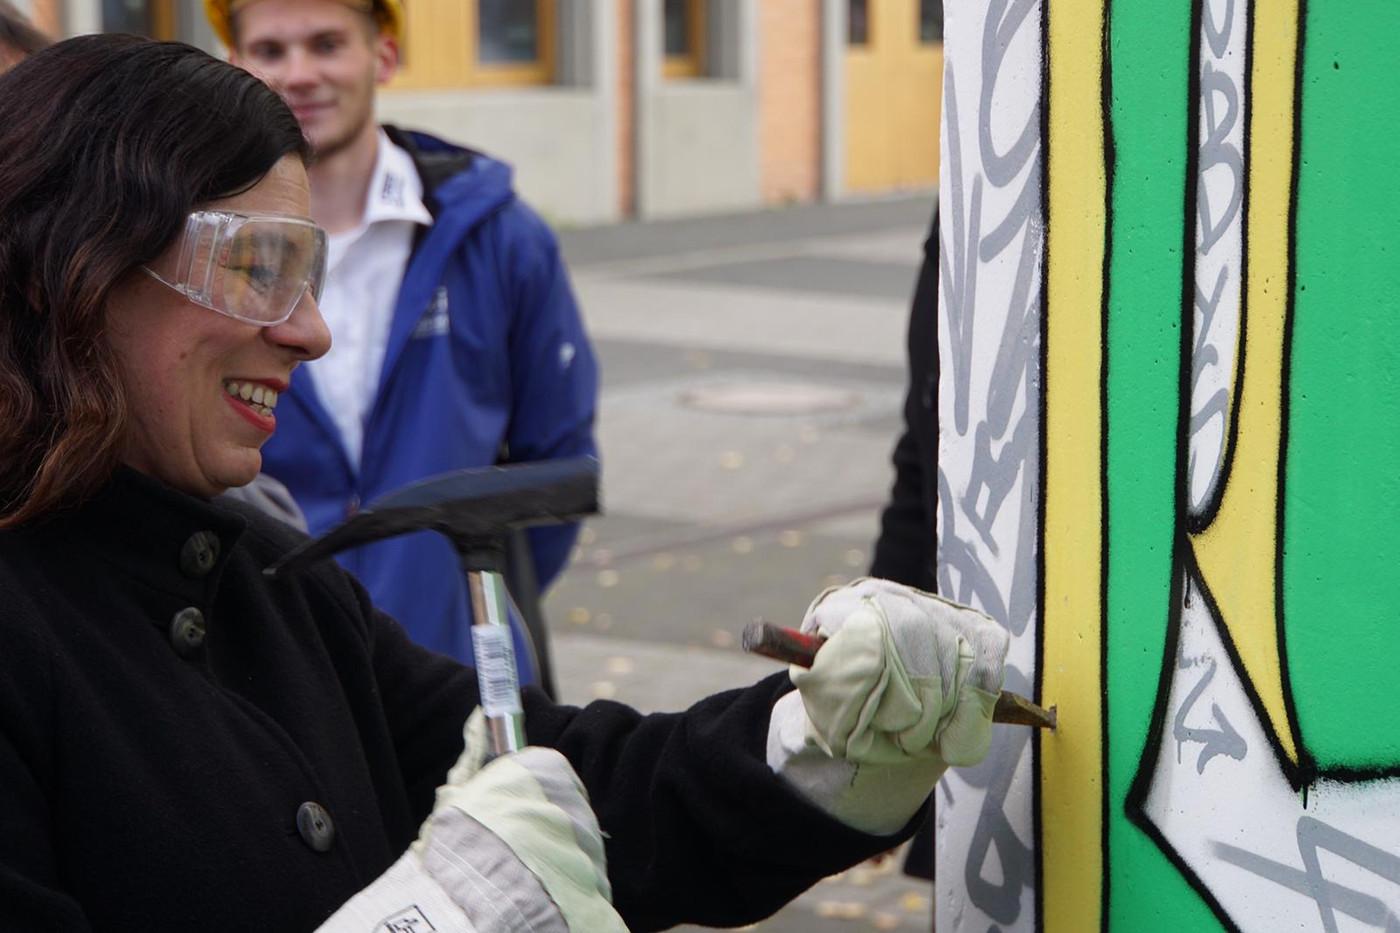 Senatorin Frau Scheeres als Mauersprecht